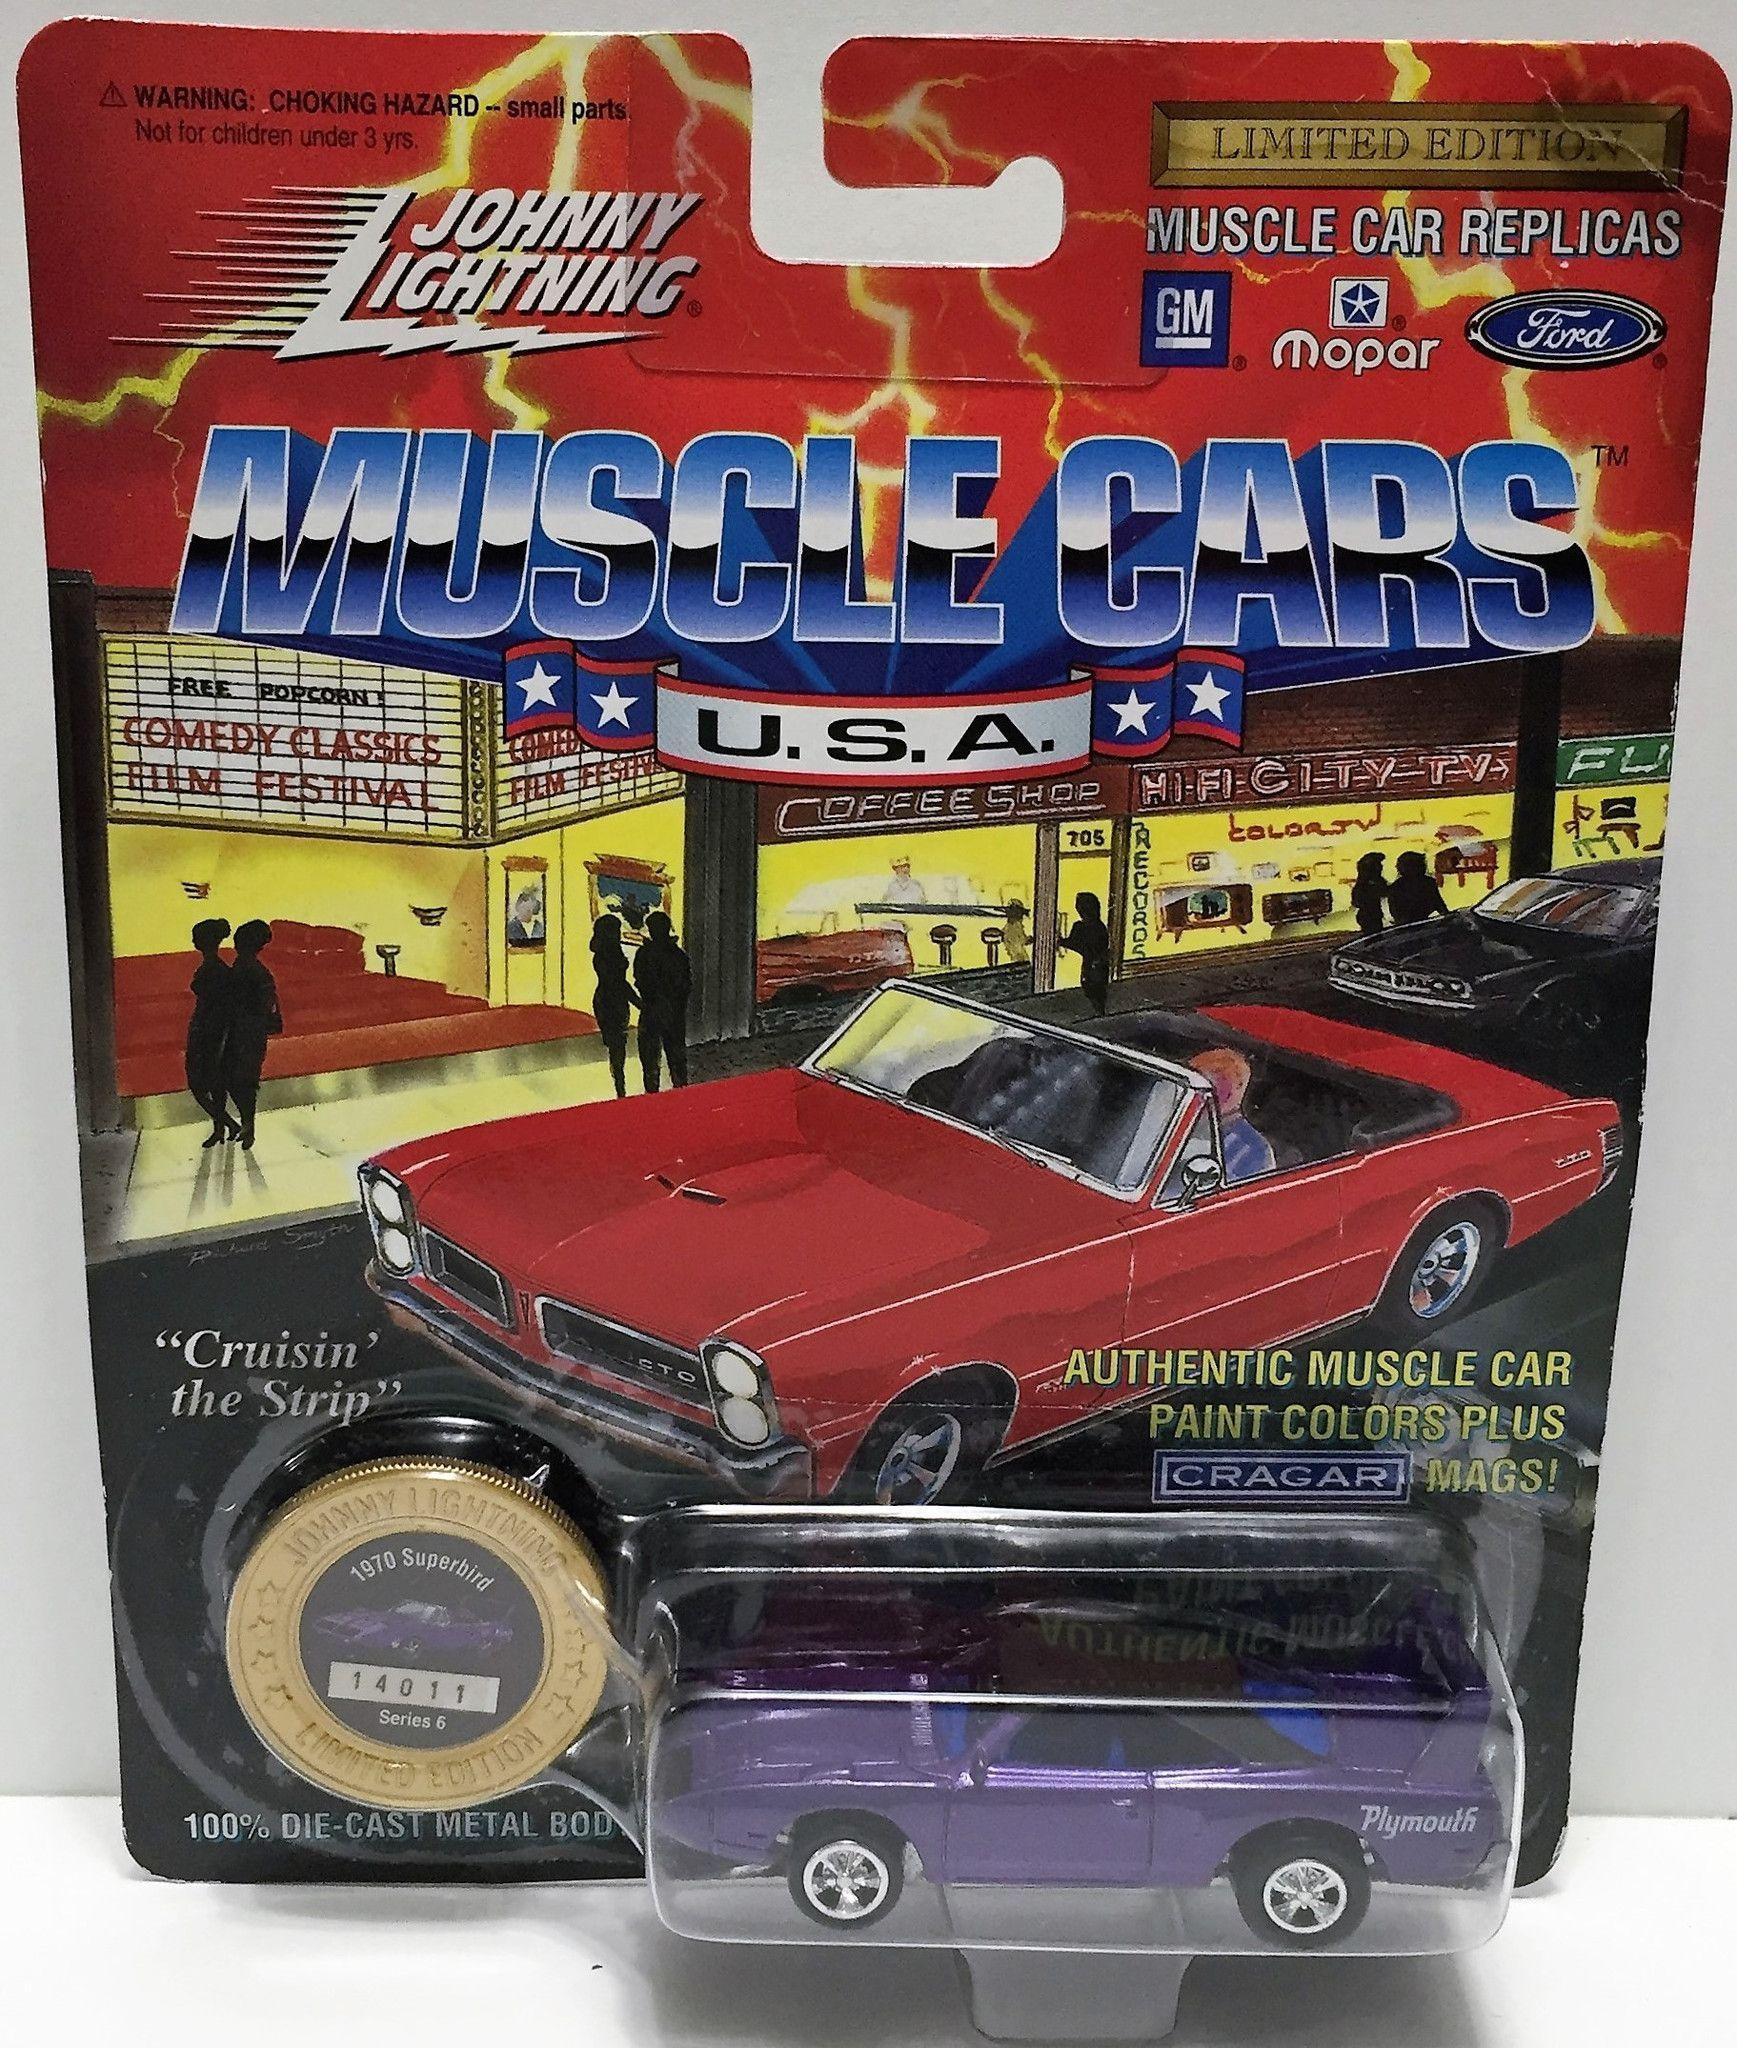 15+ Johnny lightning muscle cars 4k UHD